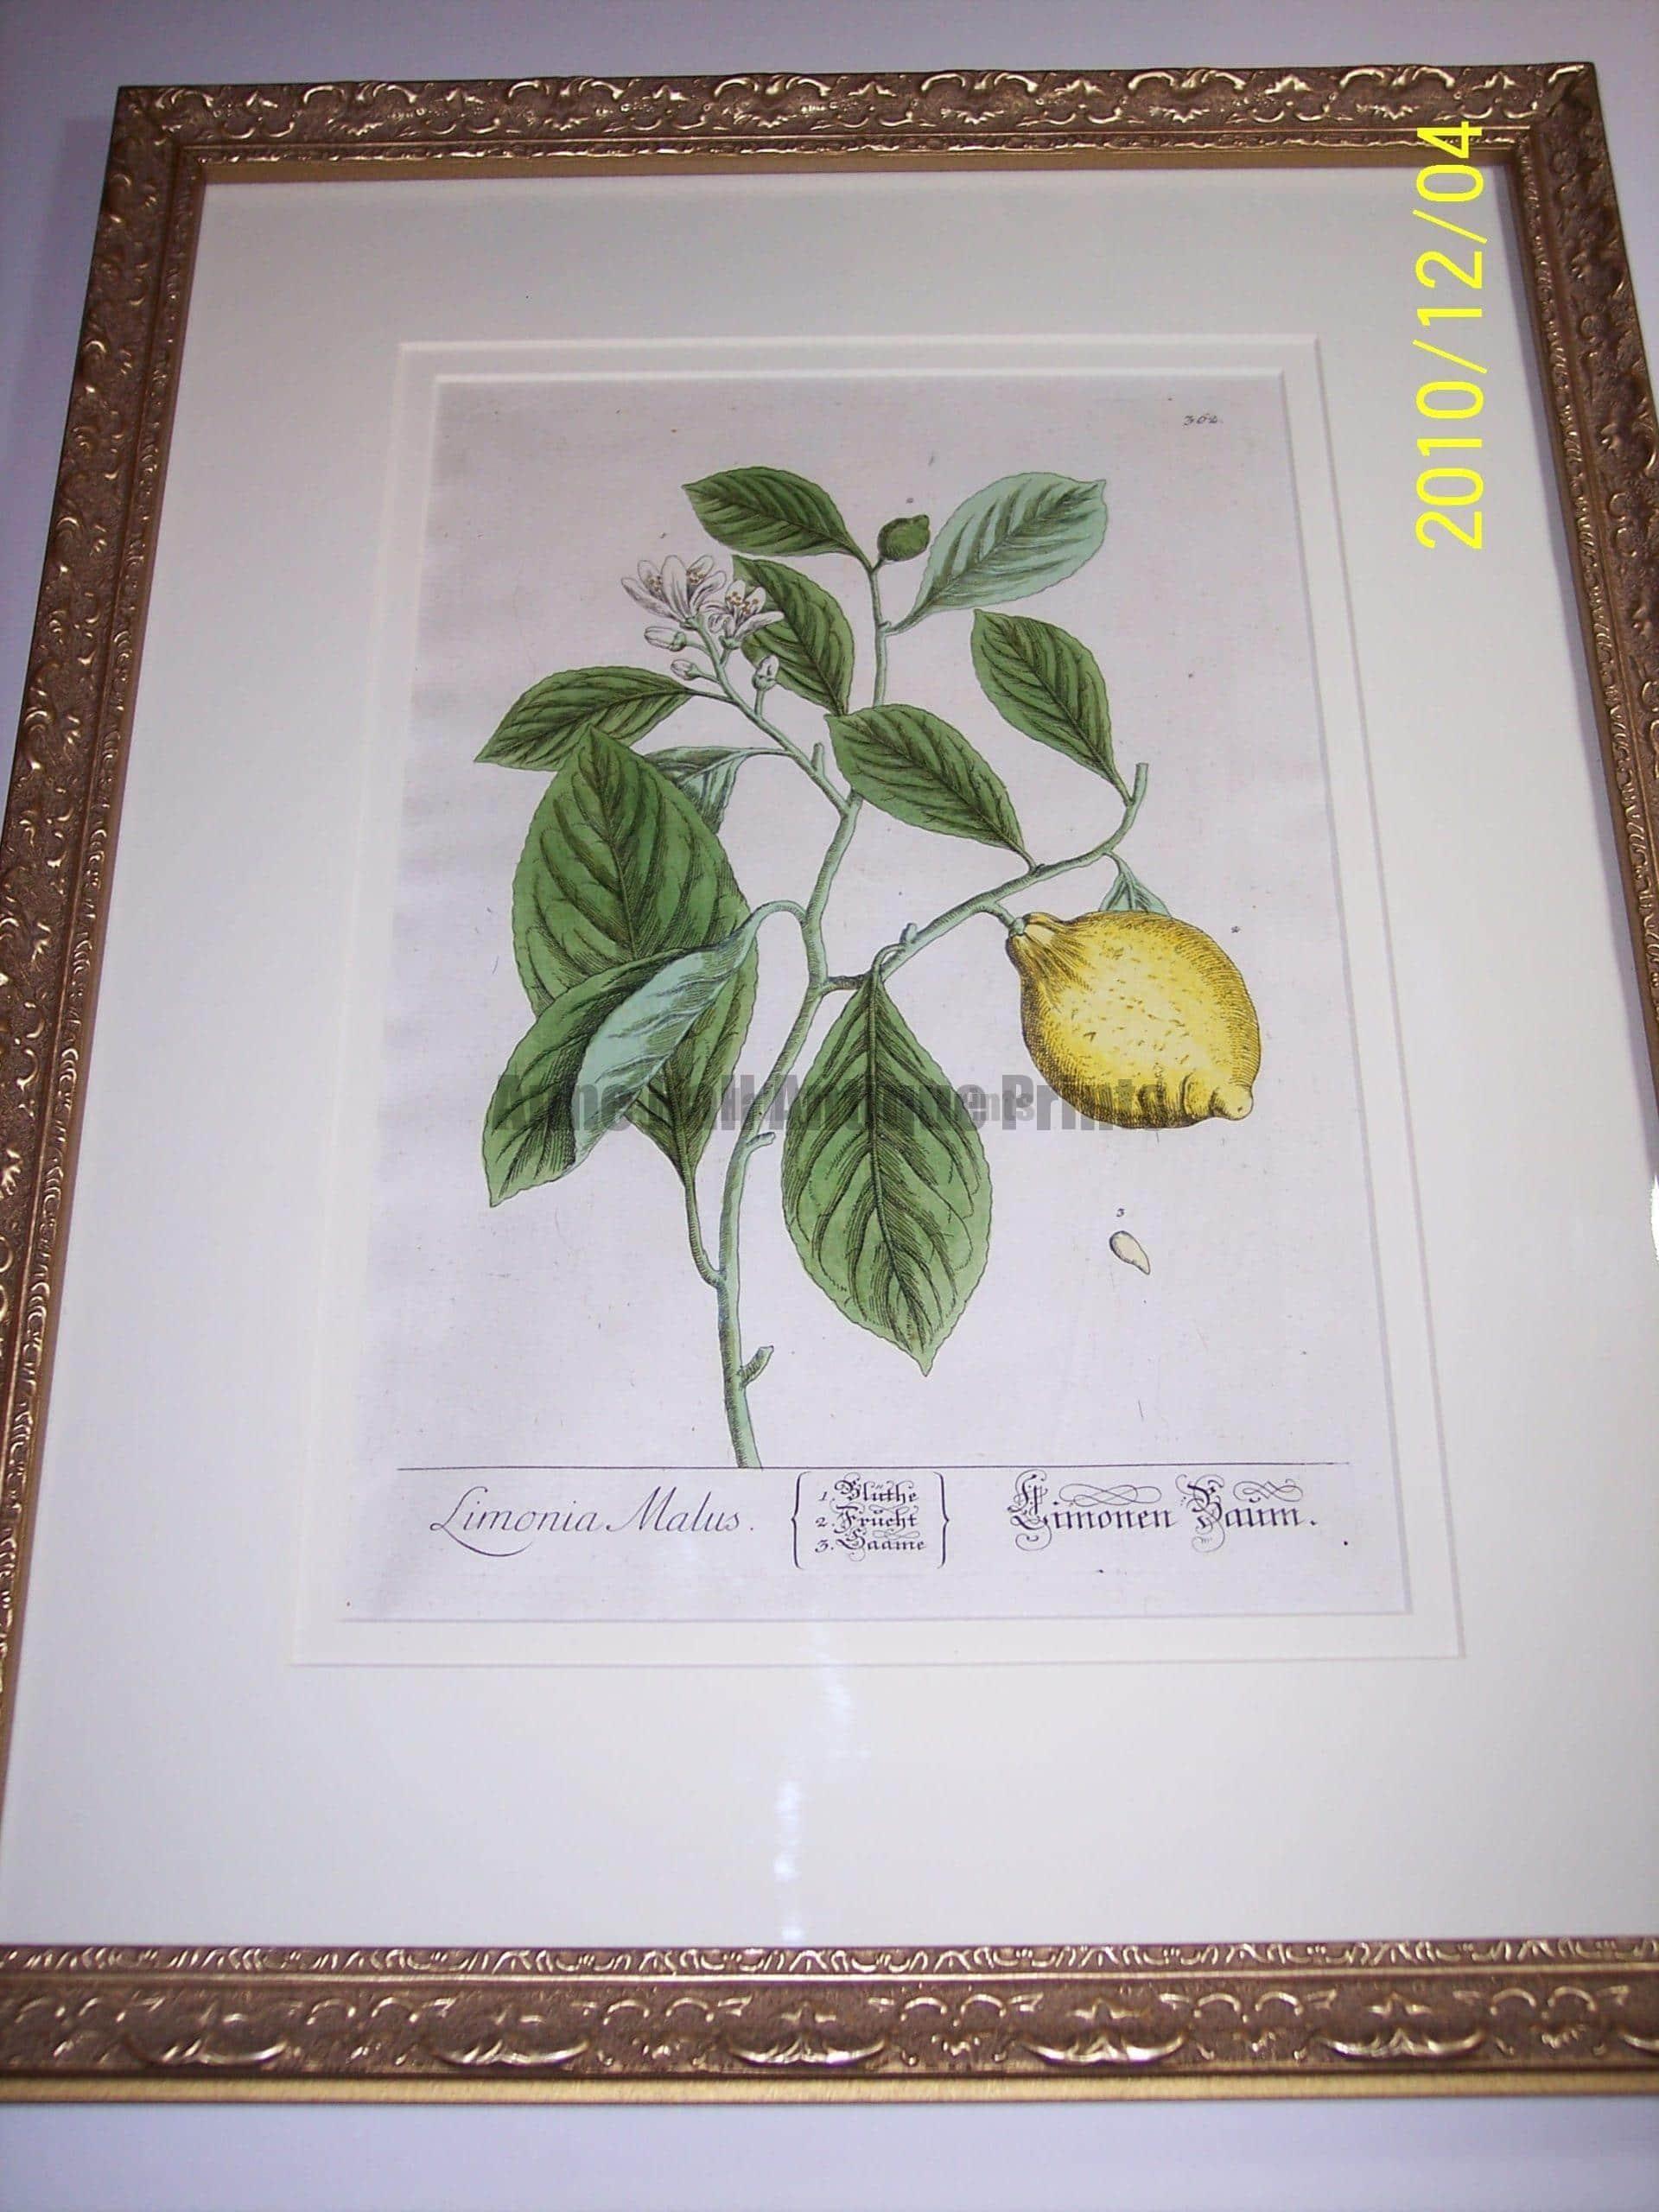 Lemons Hand Colored Blackwell. Physician's manual. Limonia Malus.